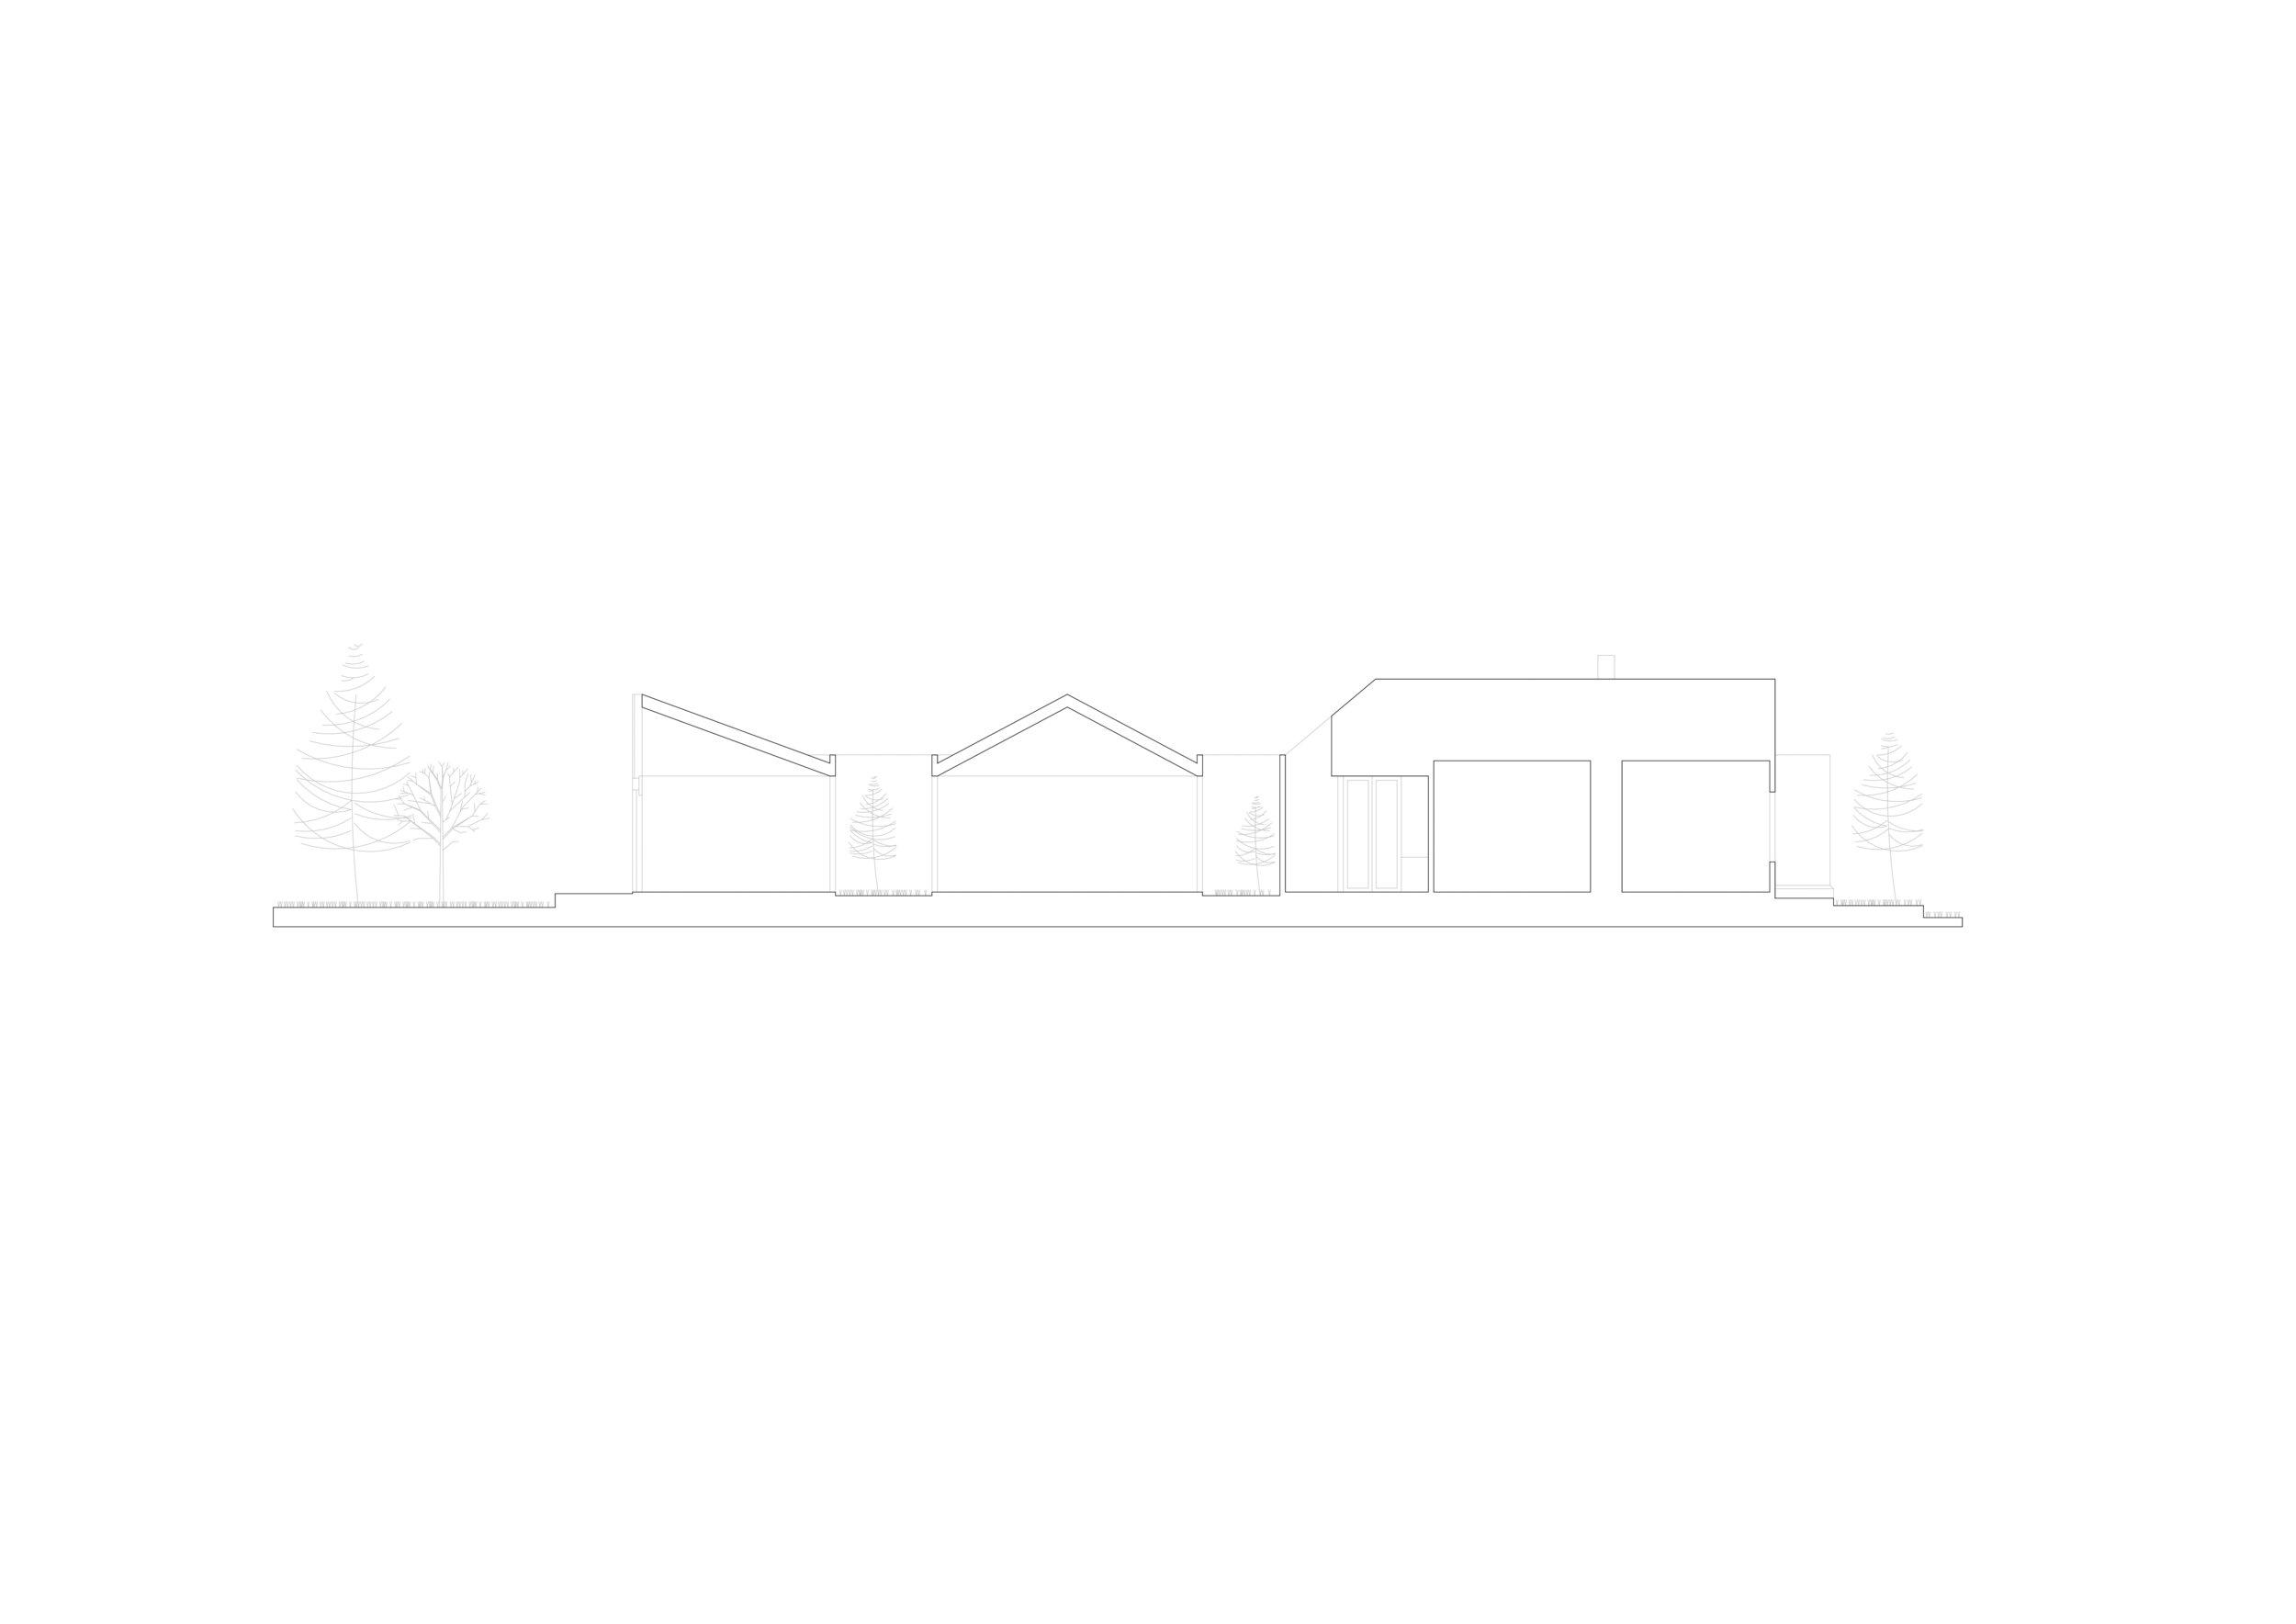 2_Spensley Street_Floor Plan_1to100.jpg